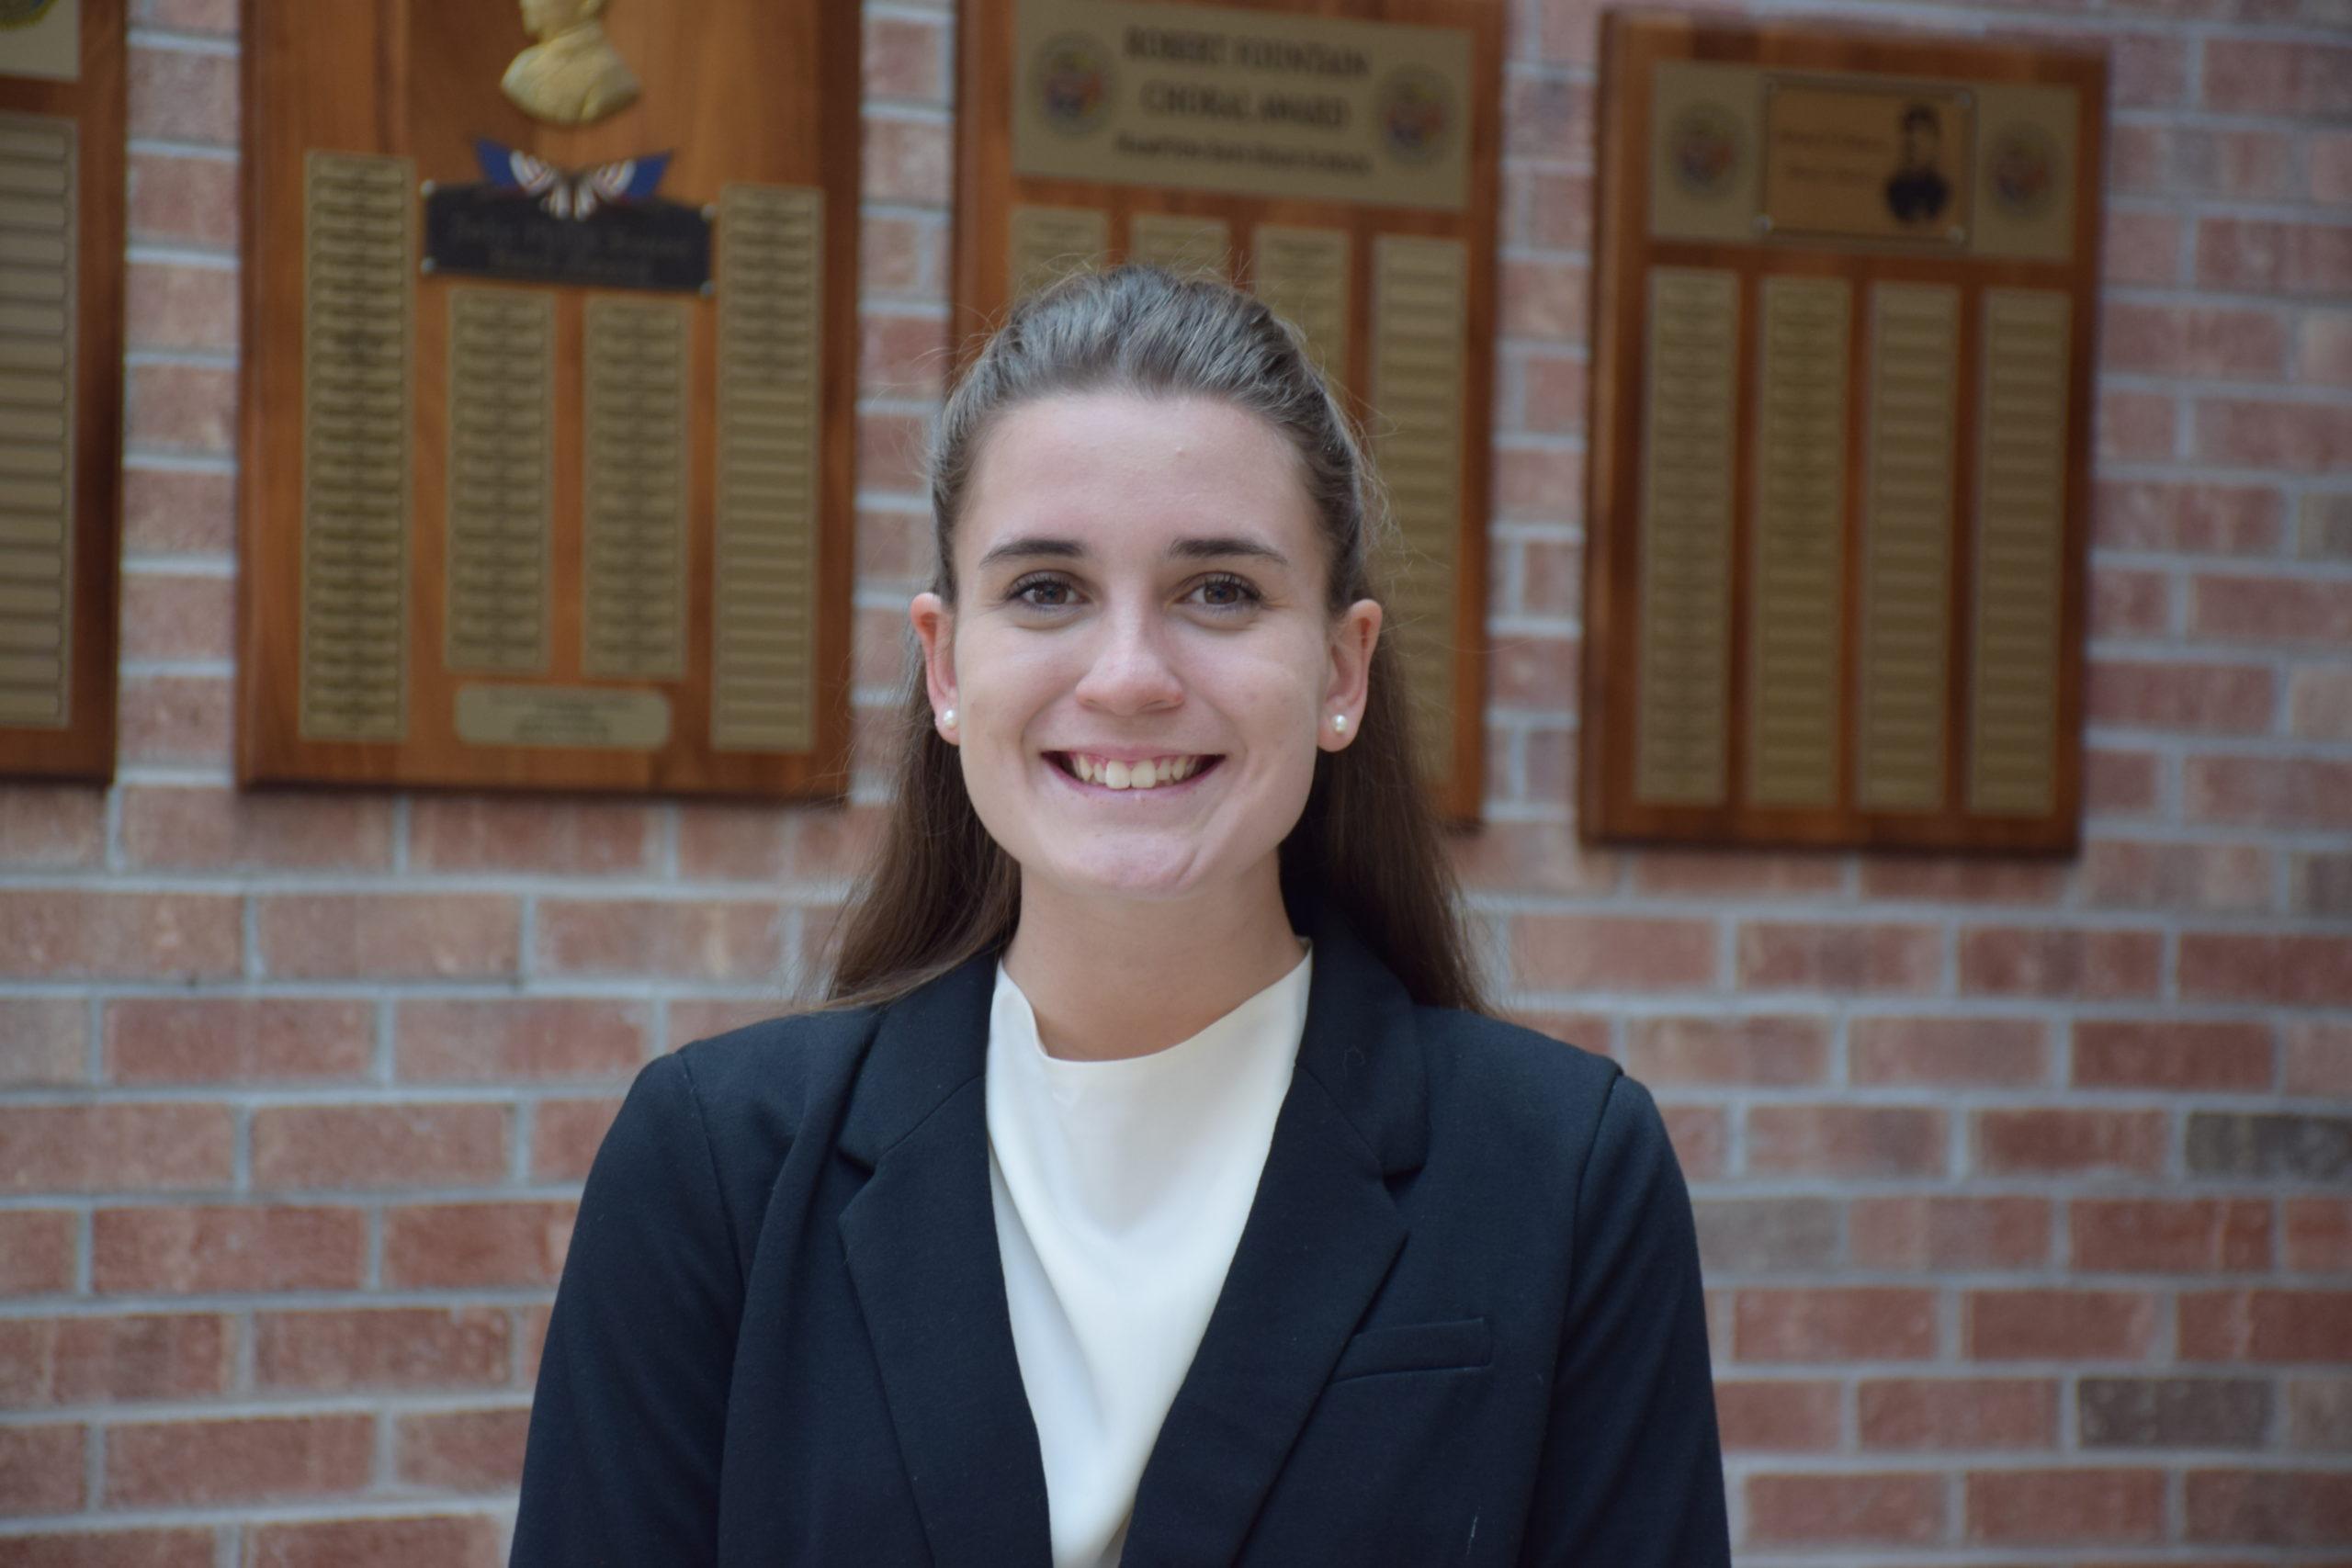 Lily Candelaria has been named Hampton Bays High School's Class of 2020 salutatorian.